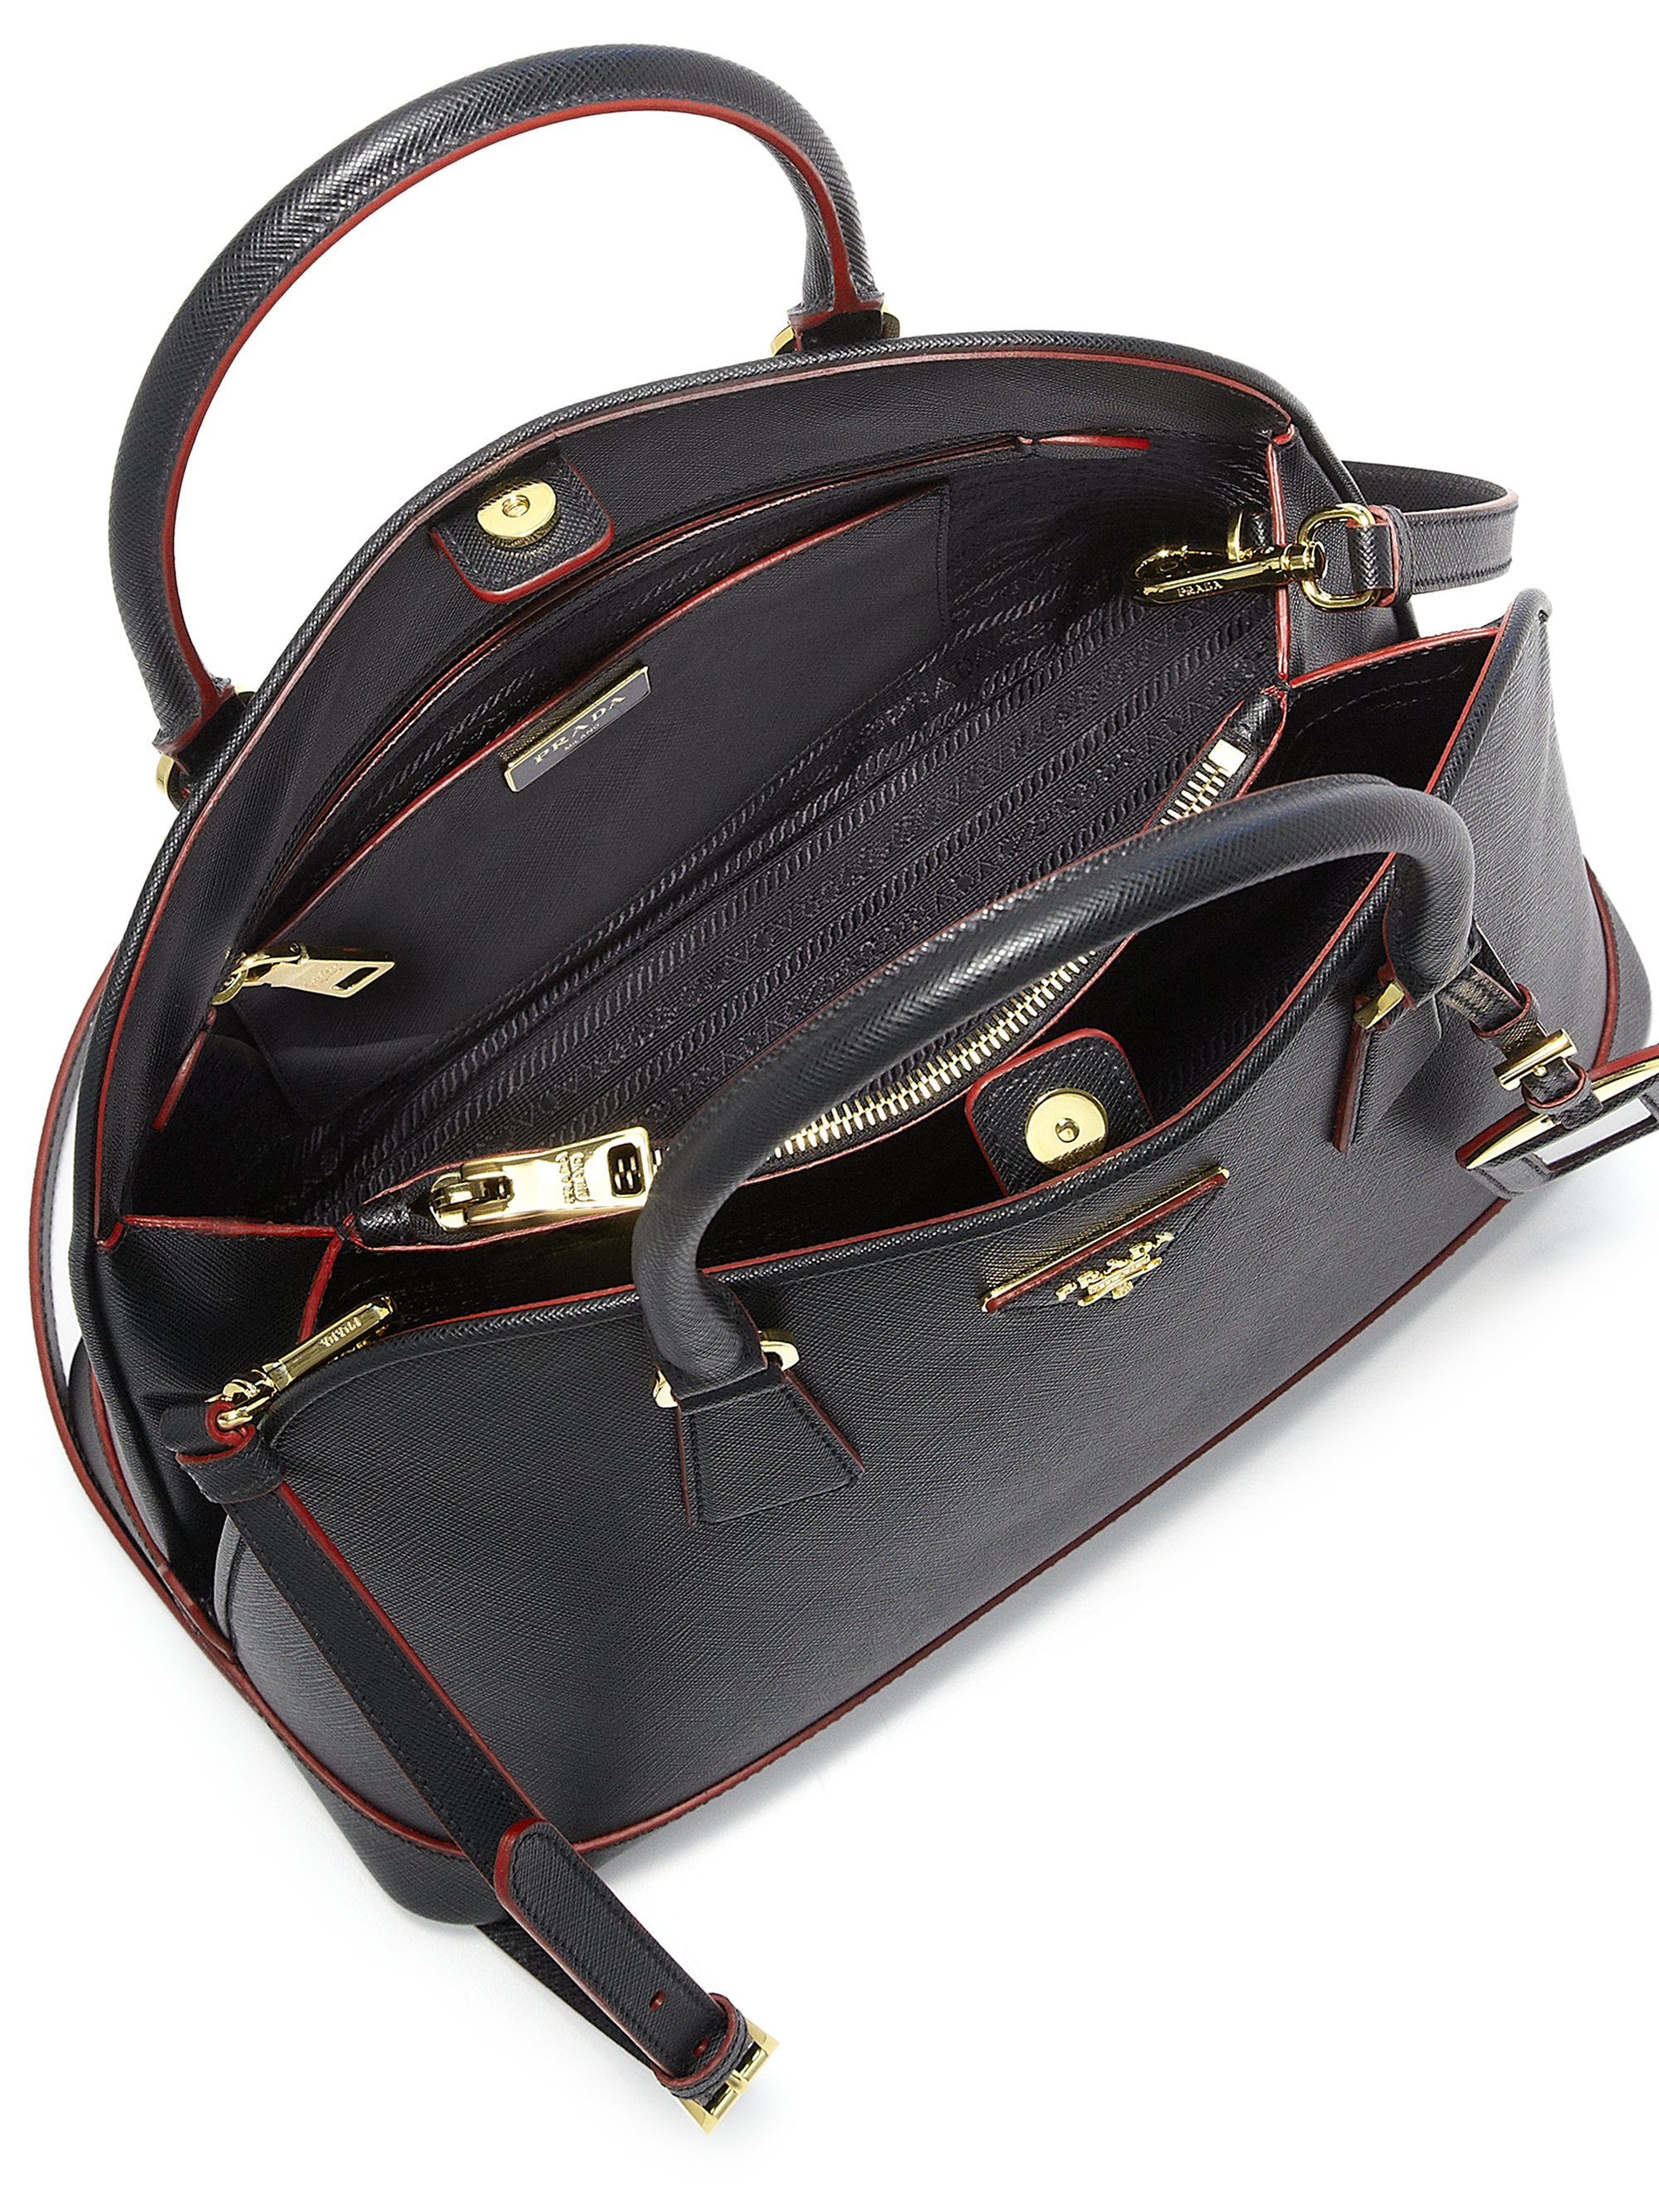 b1b73c911ab6 Lyst - Prada Saffiano Lux Promenade Leather Satchel in Black